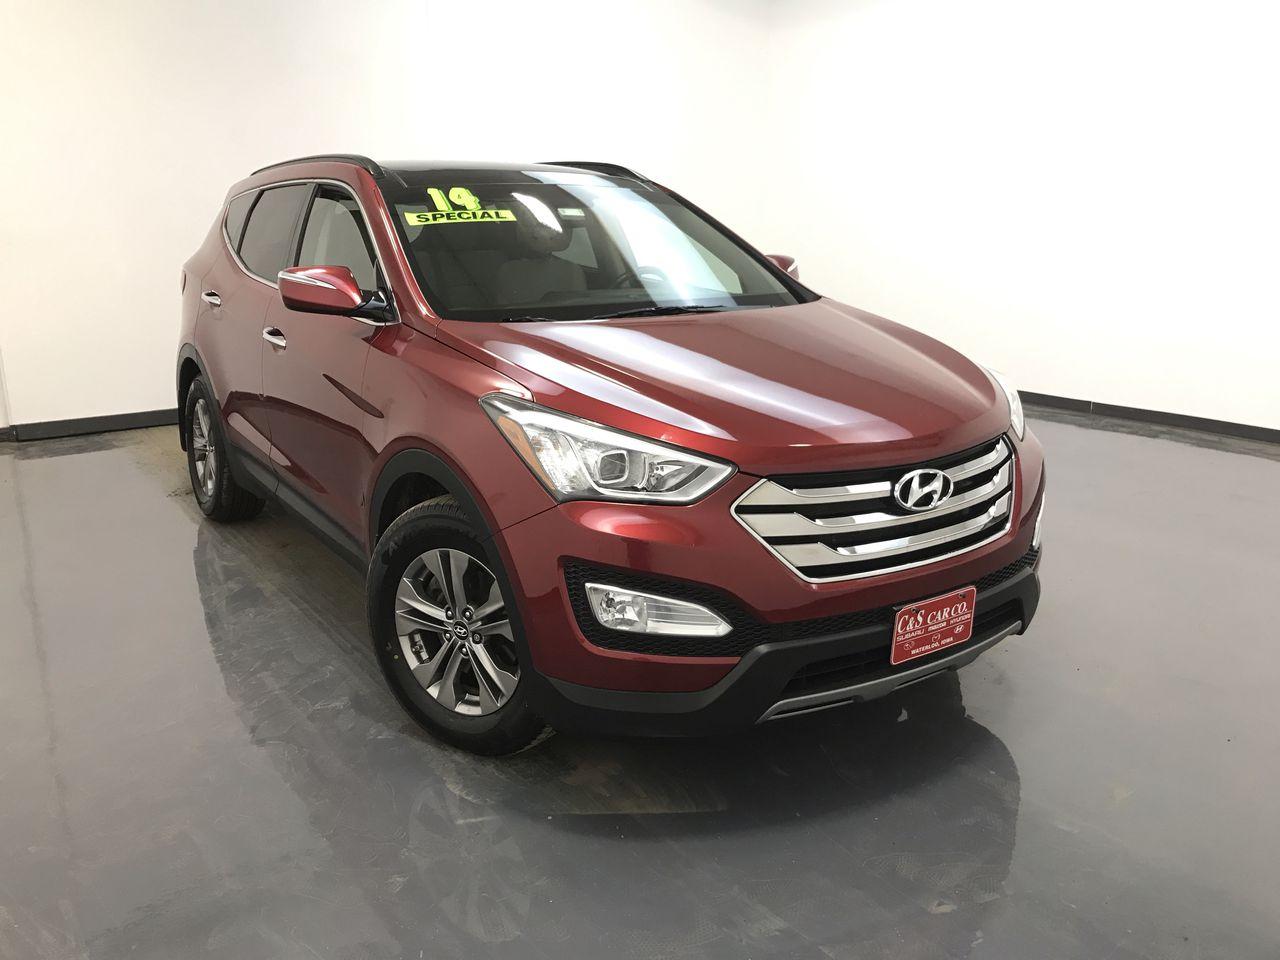 2014 Hyundai Santa Fe Sport Sport  - 16156  - C & S Car Company